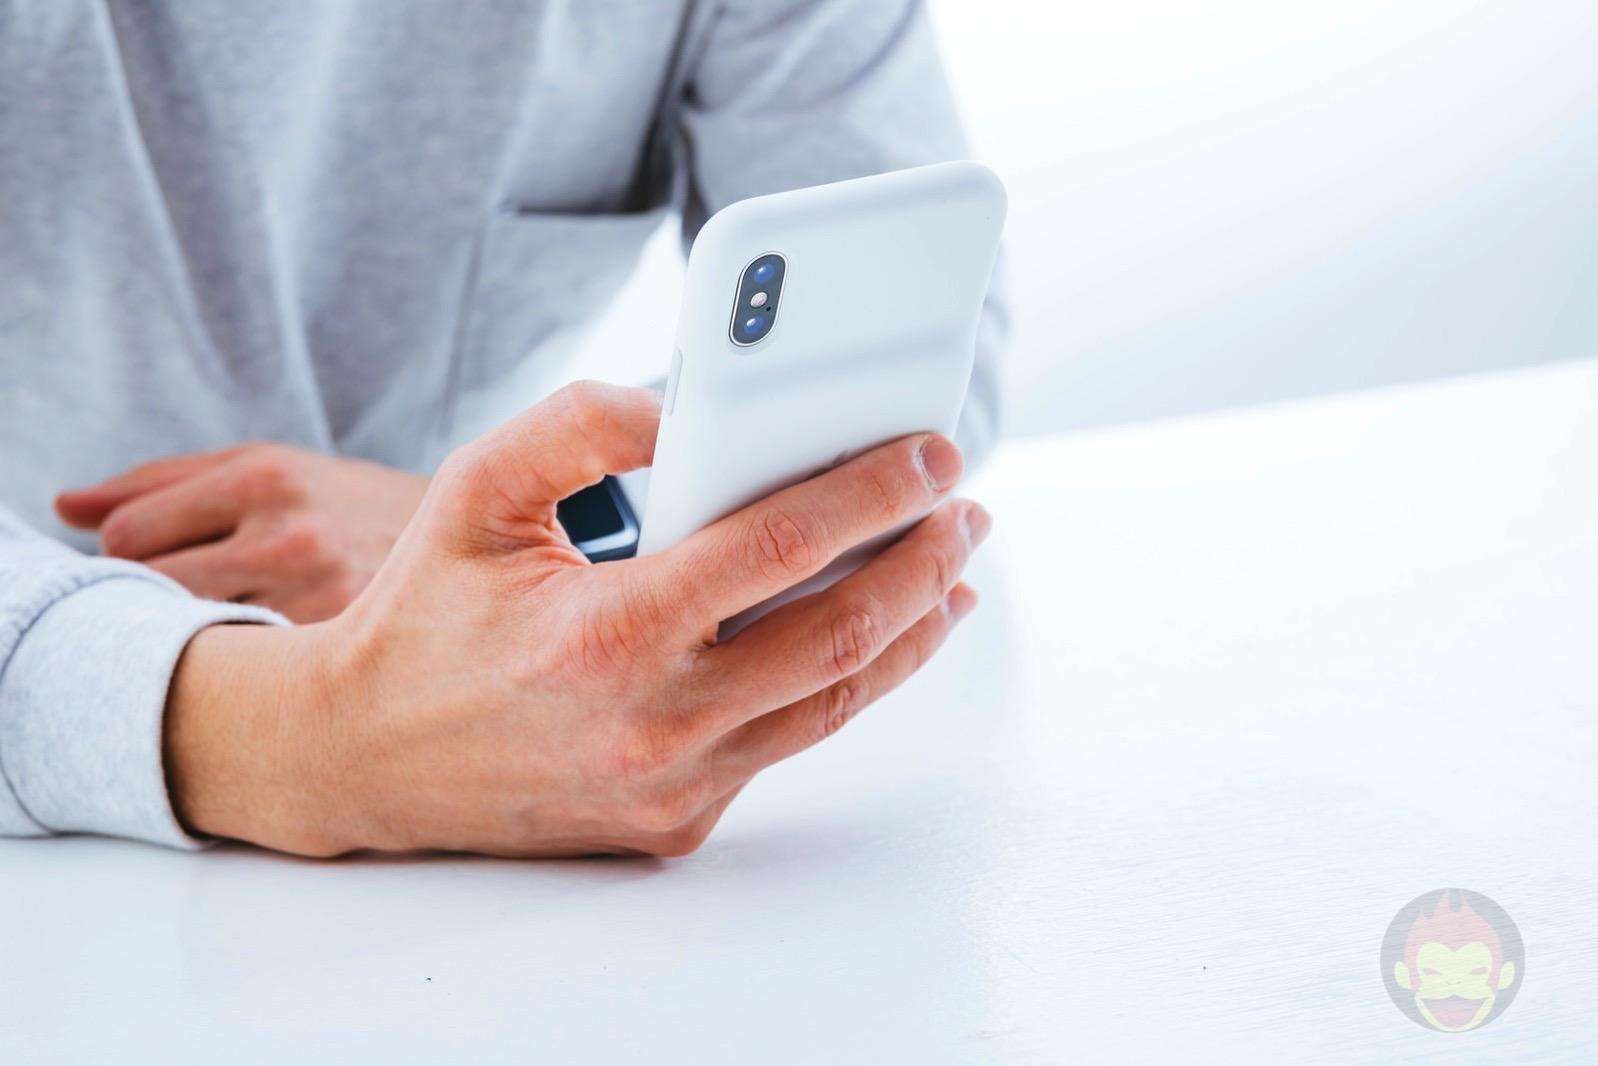 Smart-Battery-Case-for-iPhoneXS-Review-14.jpg